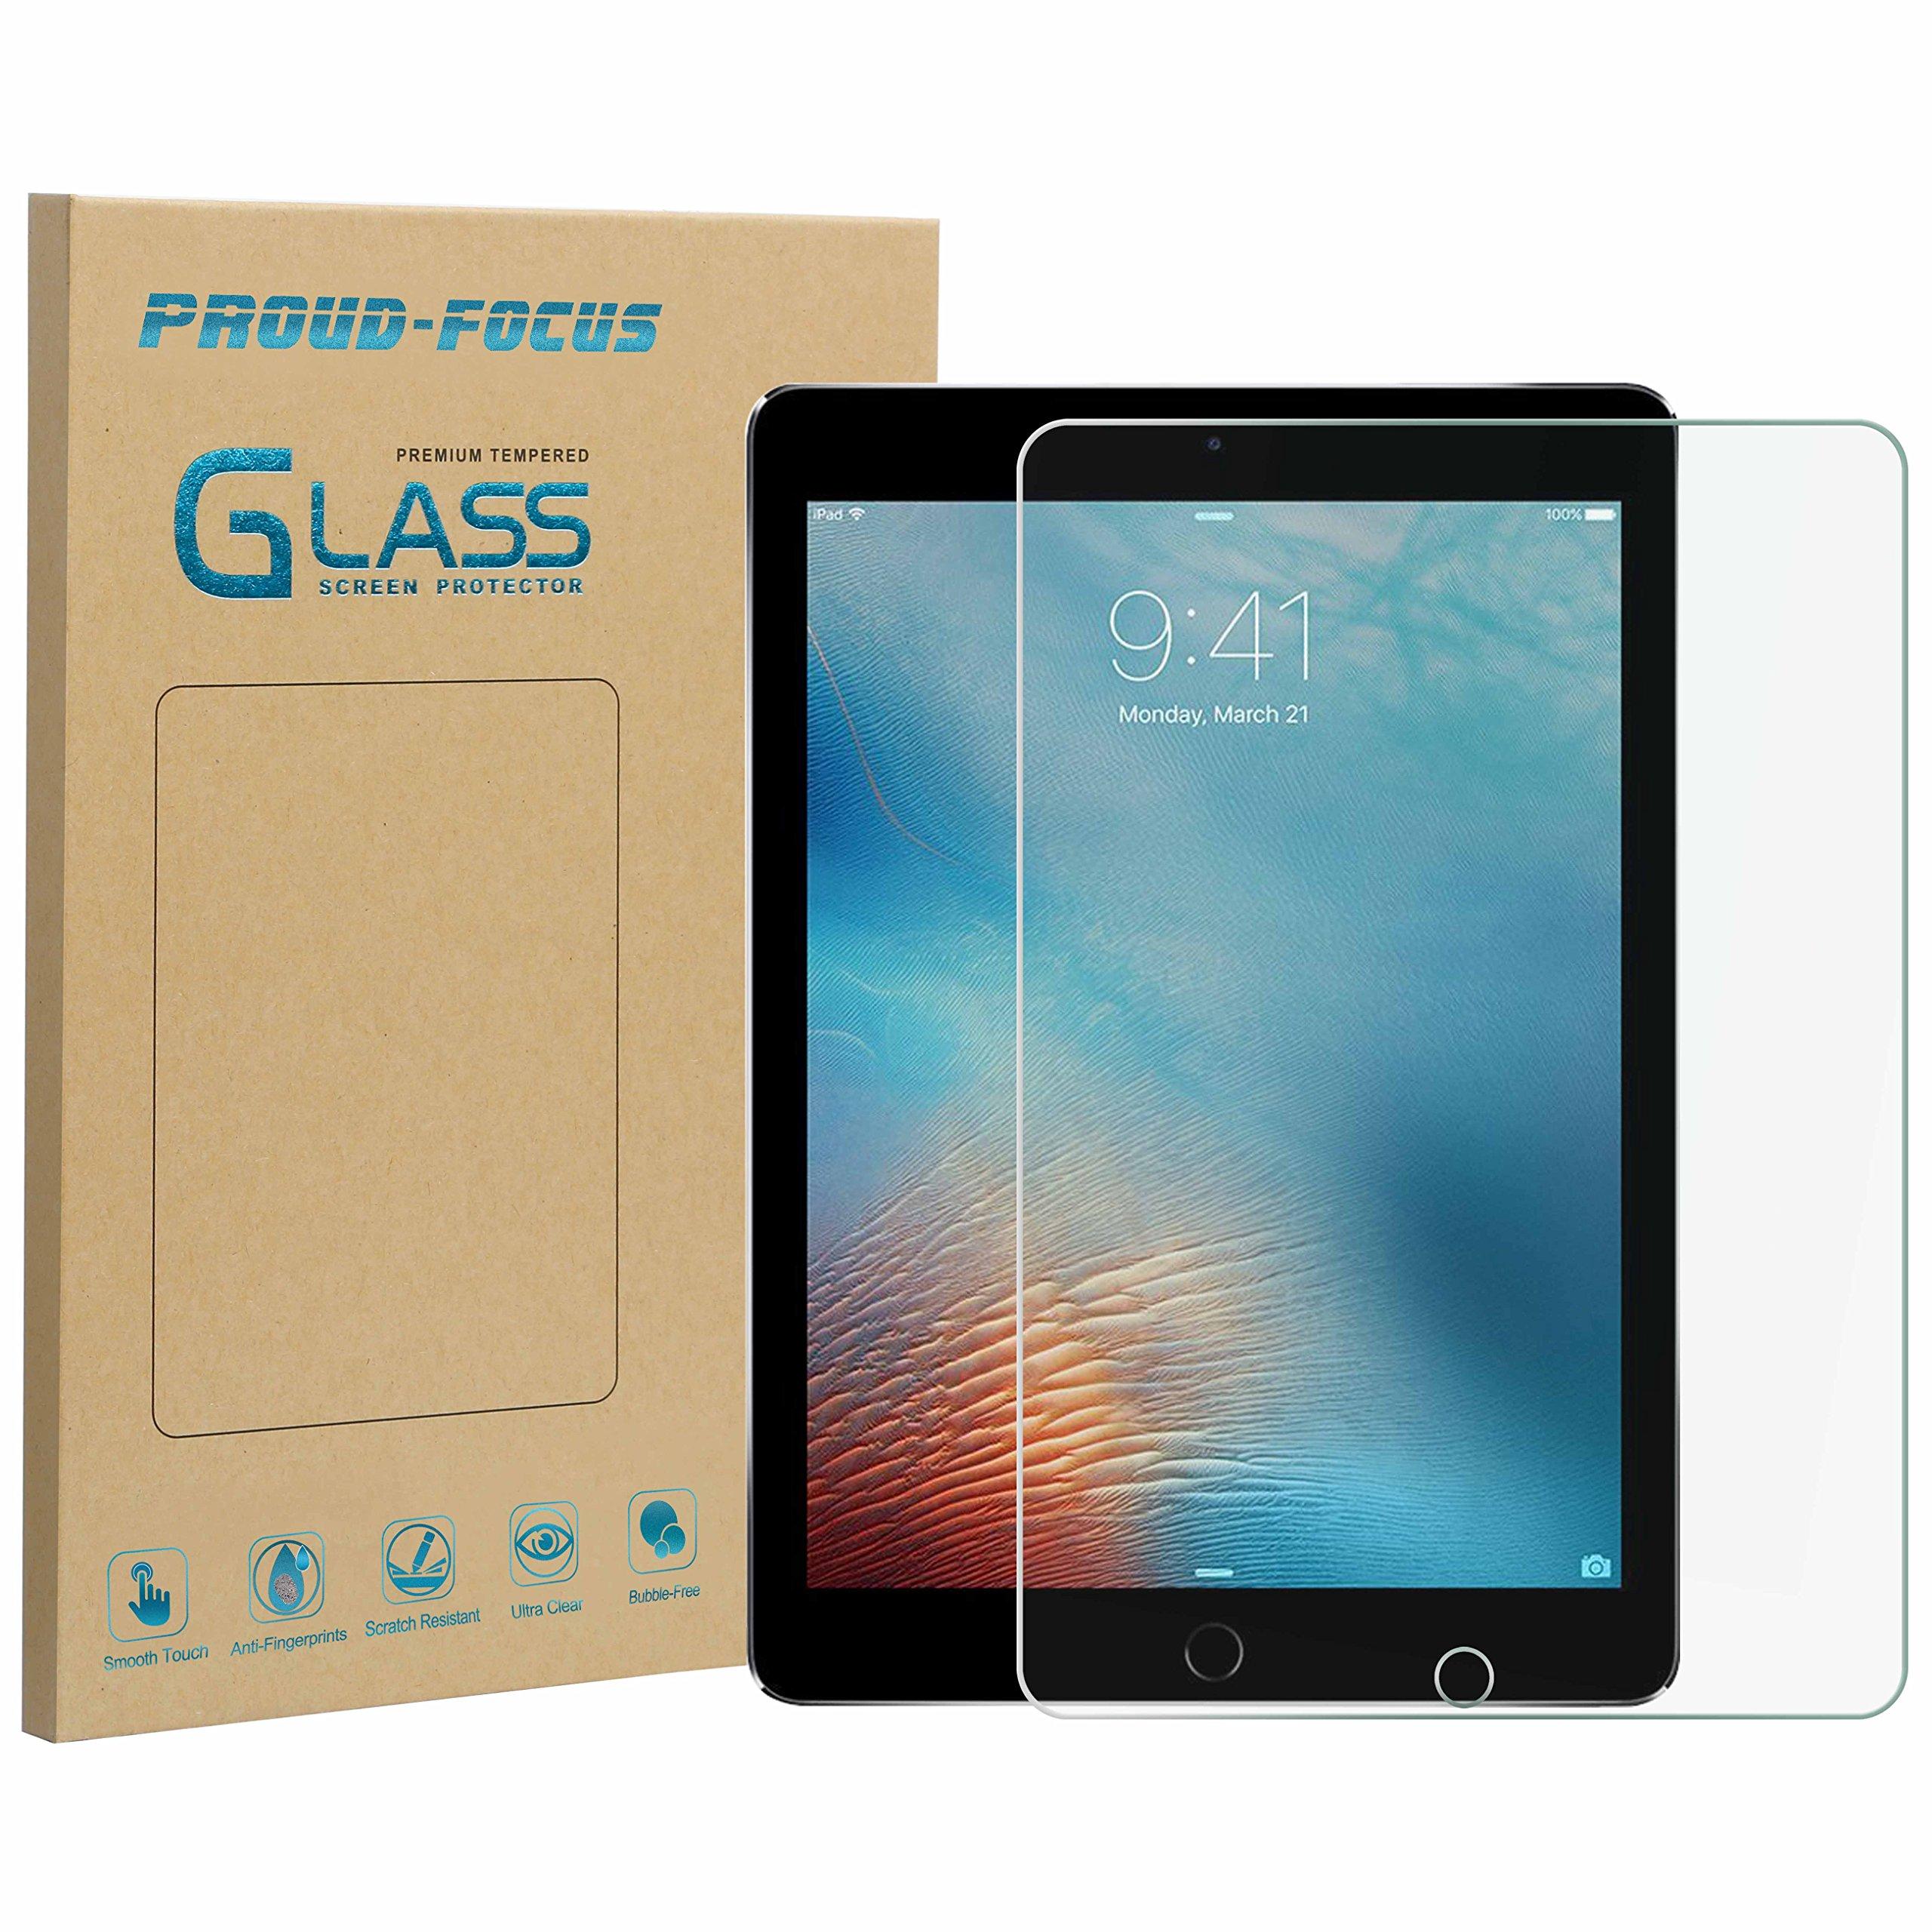 New iPad 9.7'' (2018/2017) / iPad Pro 9.7 / iPad Air 2 / iPad Air Screen Protector, Proud Focus Tempered Glass Screen Protector for iPad Air 2, iPad Air, iPad Pro 9.7 inch, 5th/6th Gen 2016 2017 2018